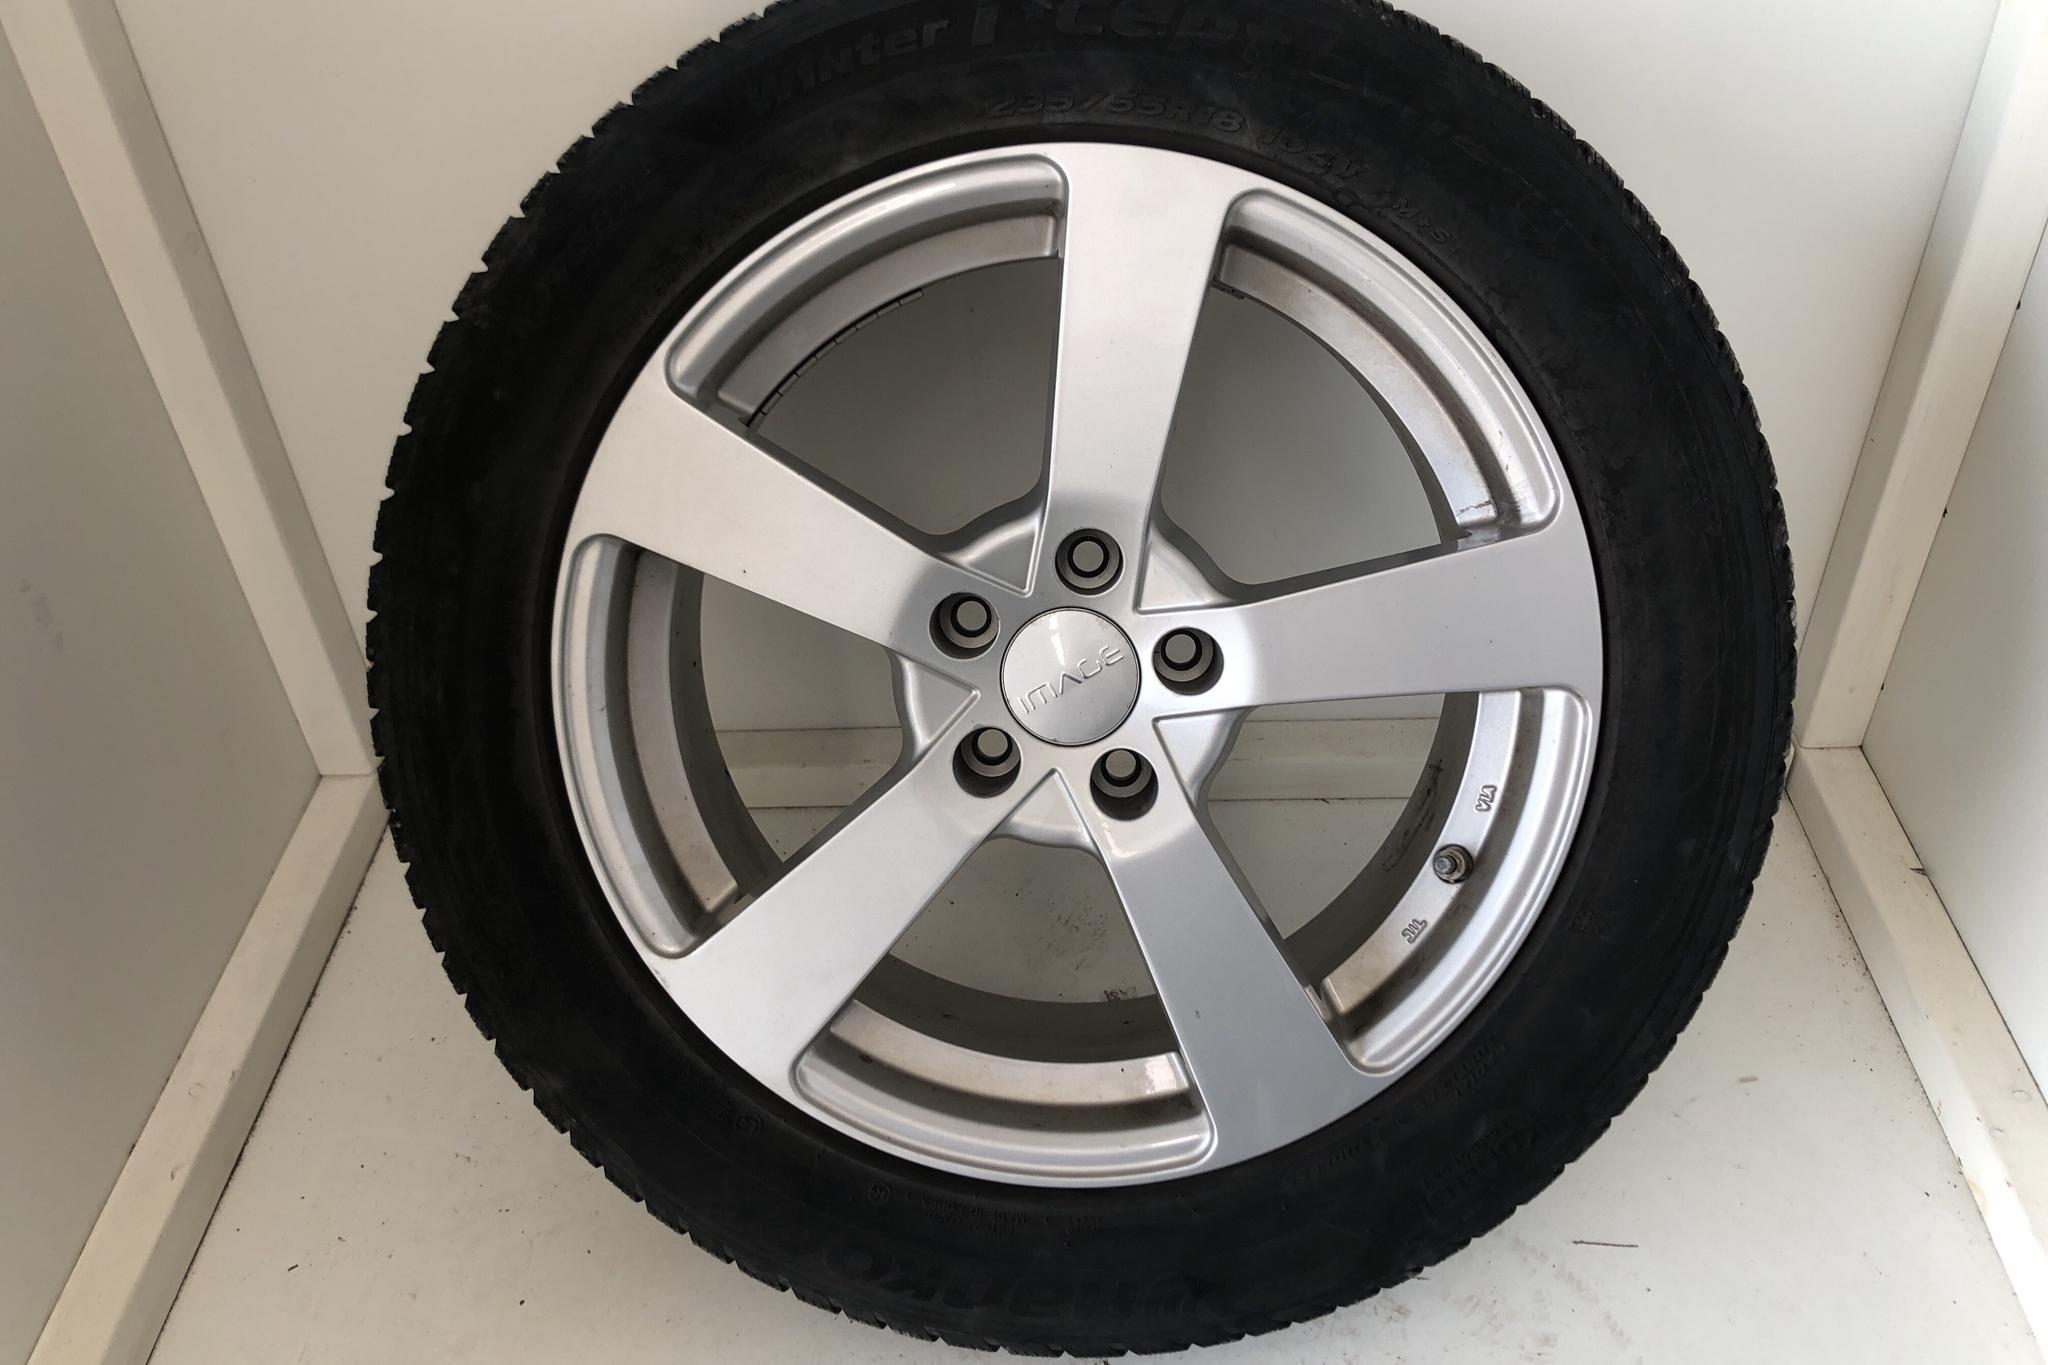 Toyota RAV4 2.5 HSD AWD (197hk) - 4 967 mil - Automat - vit - 2018